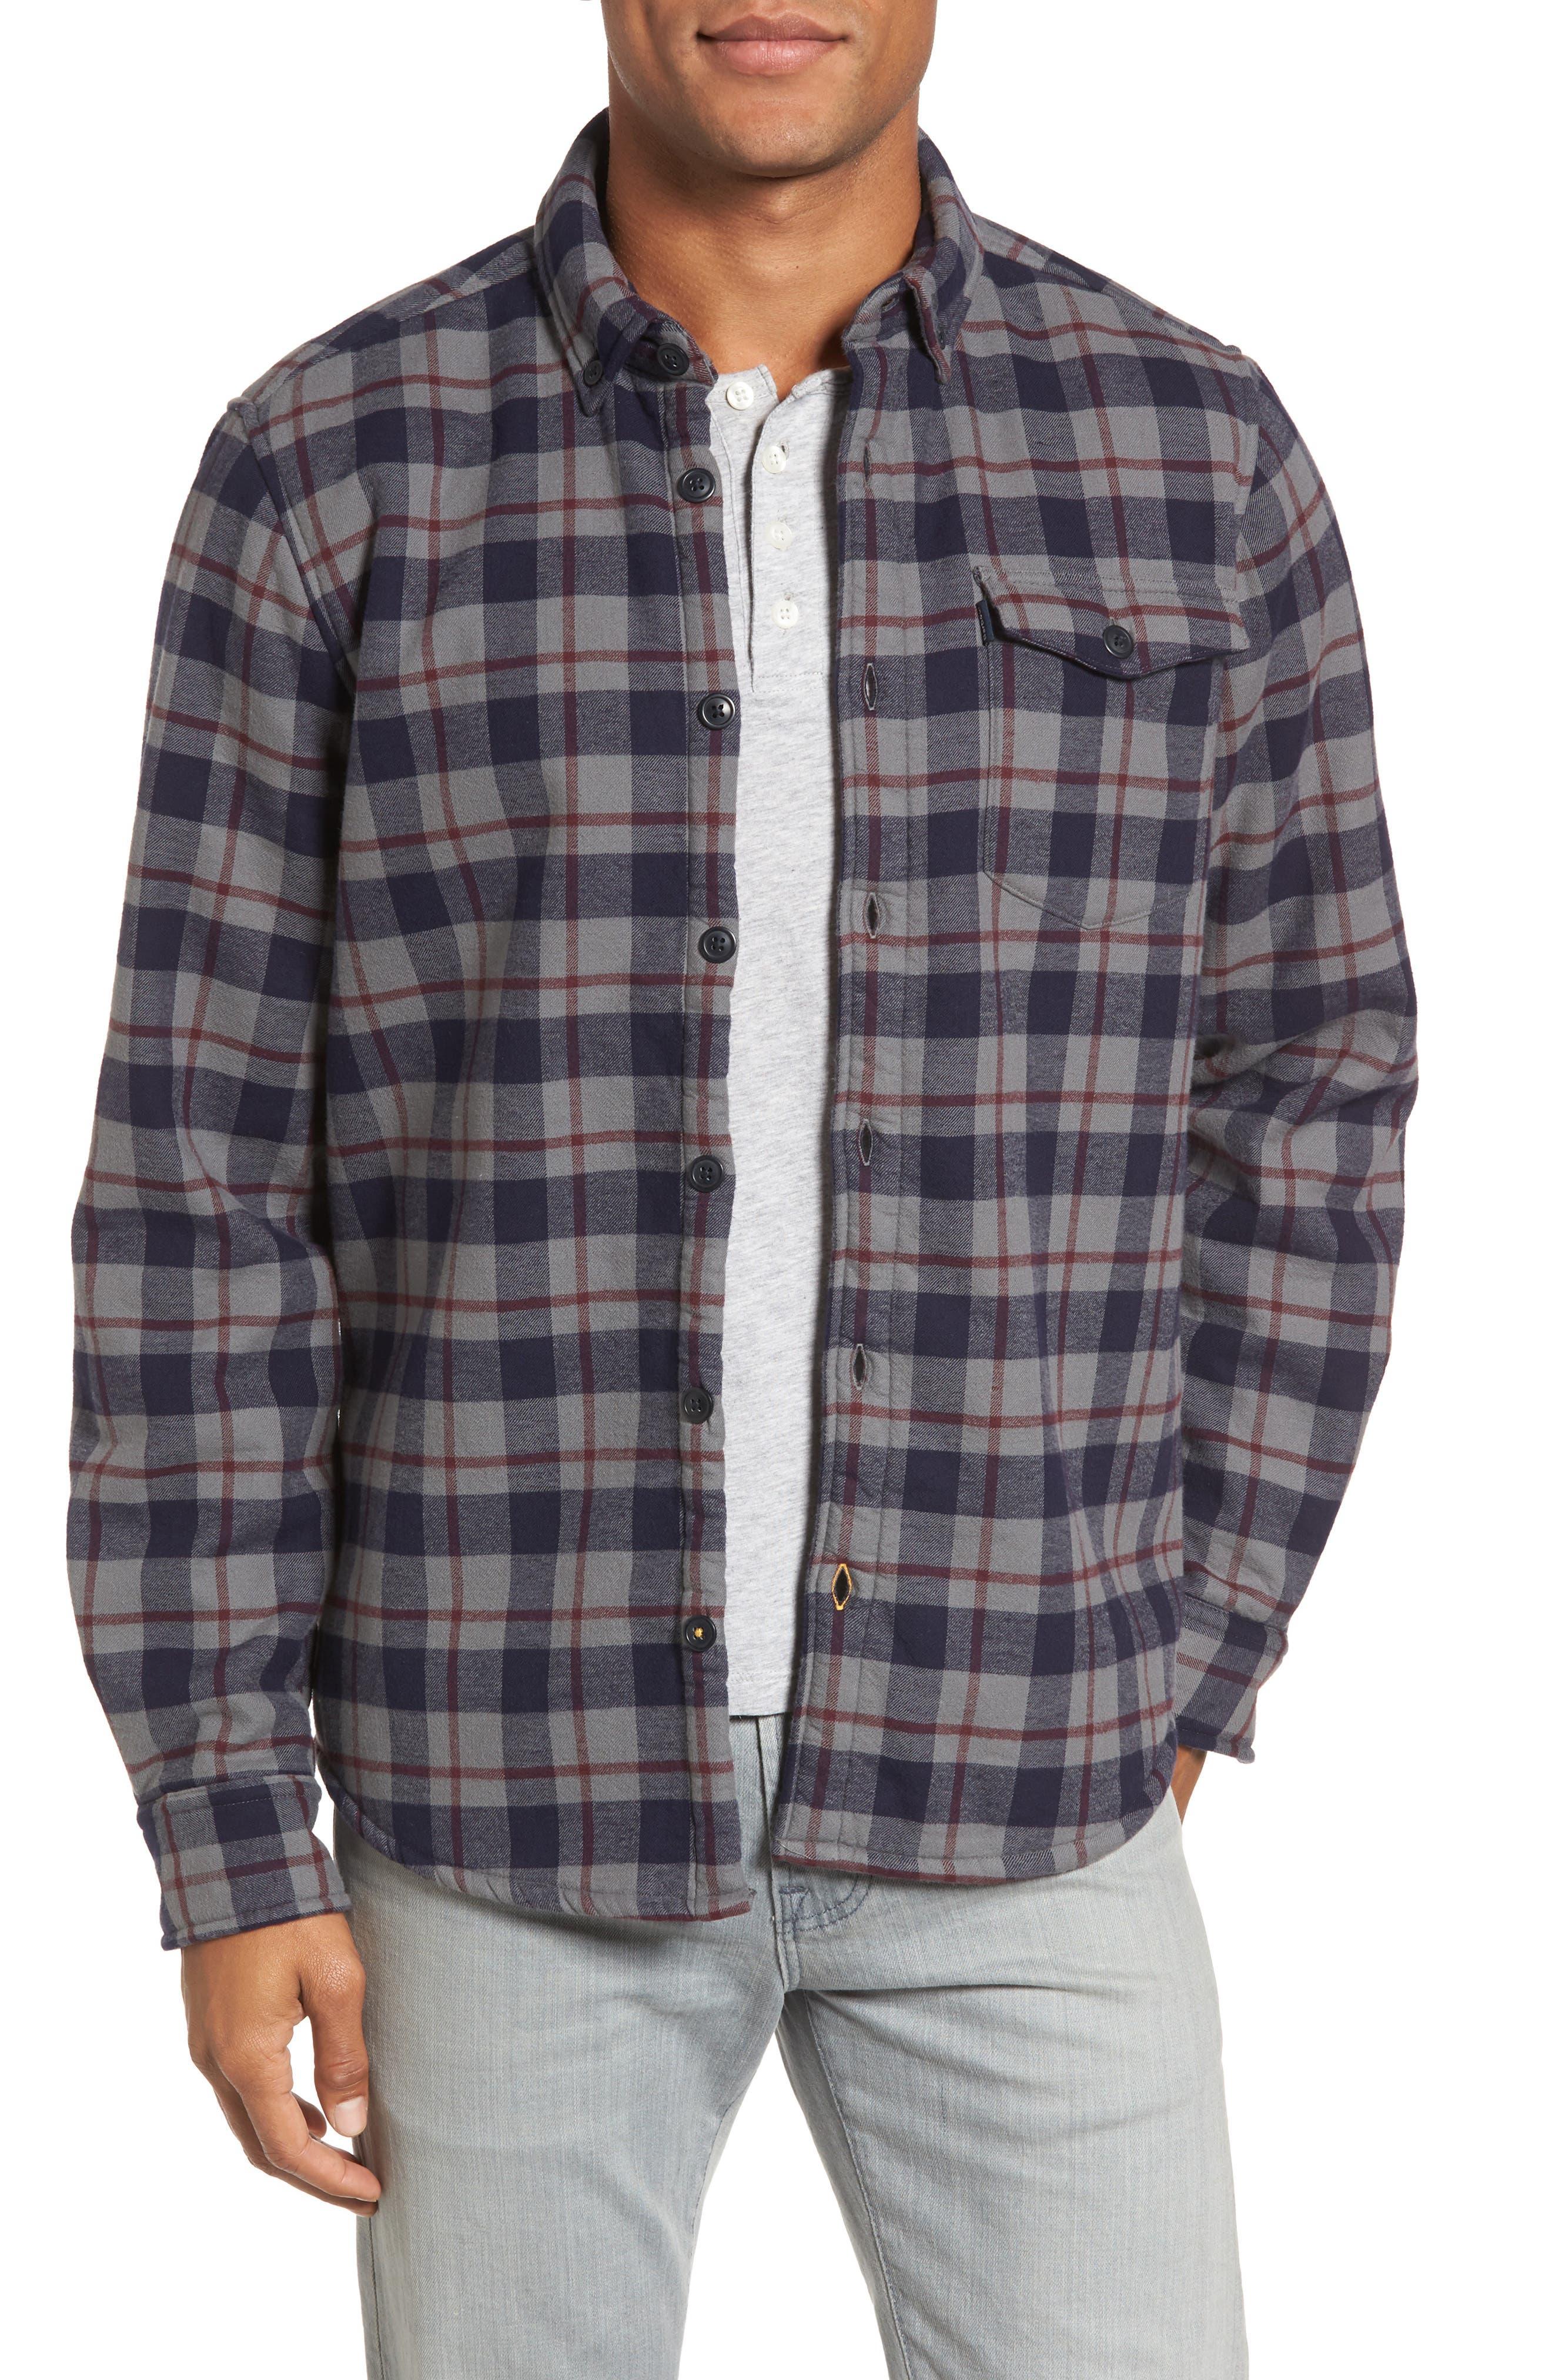 Hamilton Regular Fit Faux Fur Lined Shirt Jacket,                             Main thumbnail 1, color,                             Grey